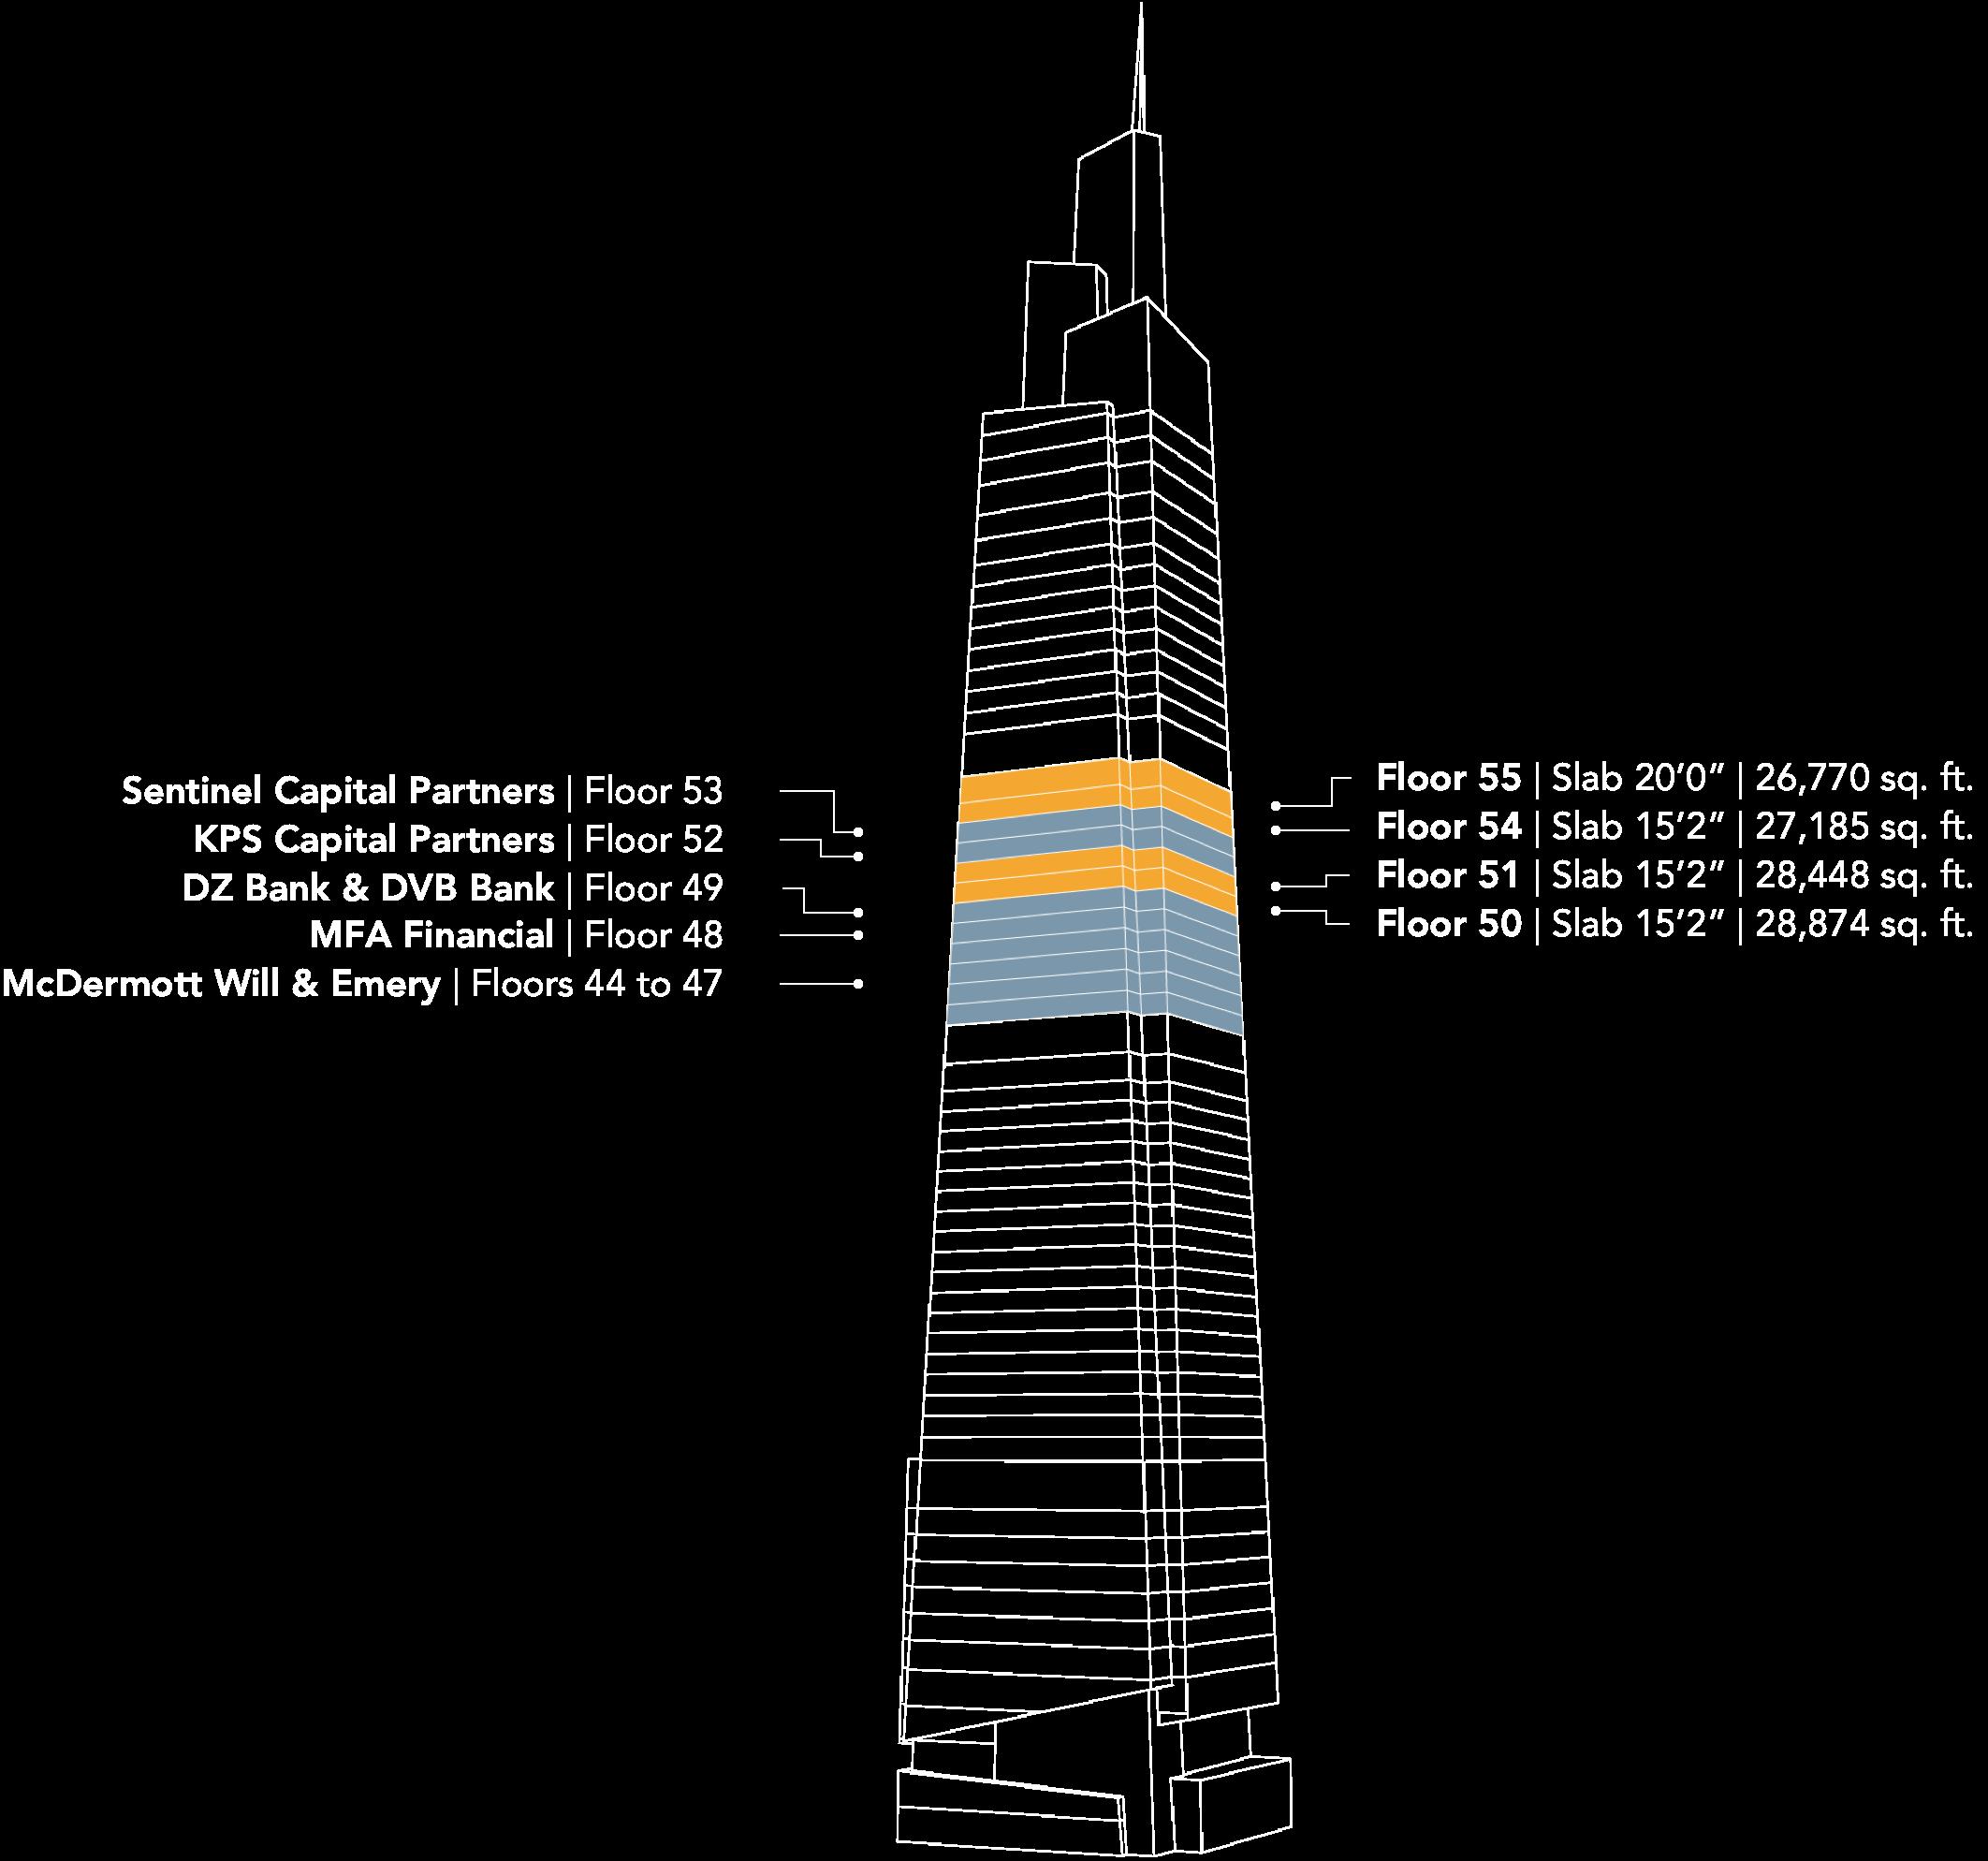 "Floors 44to 55, Tower Floors Slab 15'2"", 26770 to 29303 square feet each"